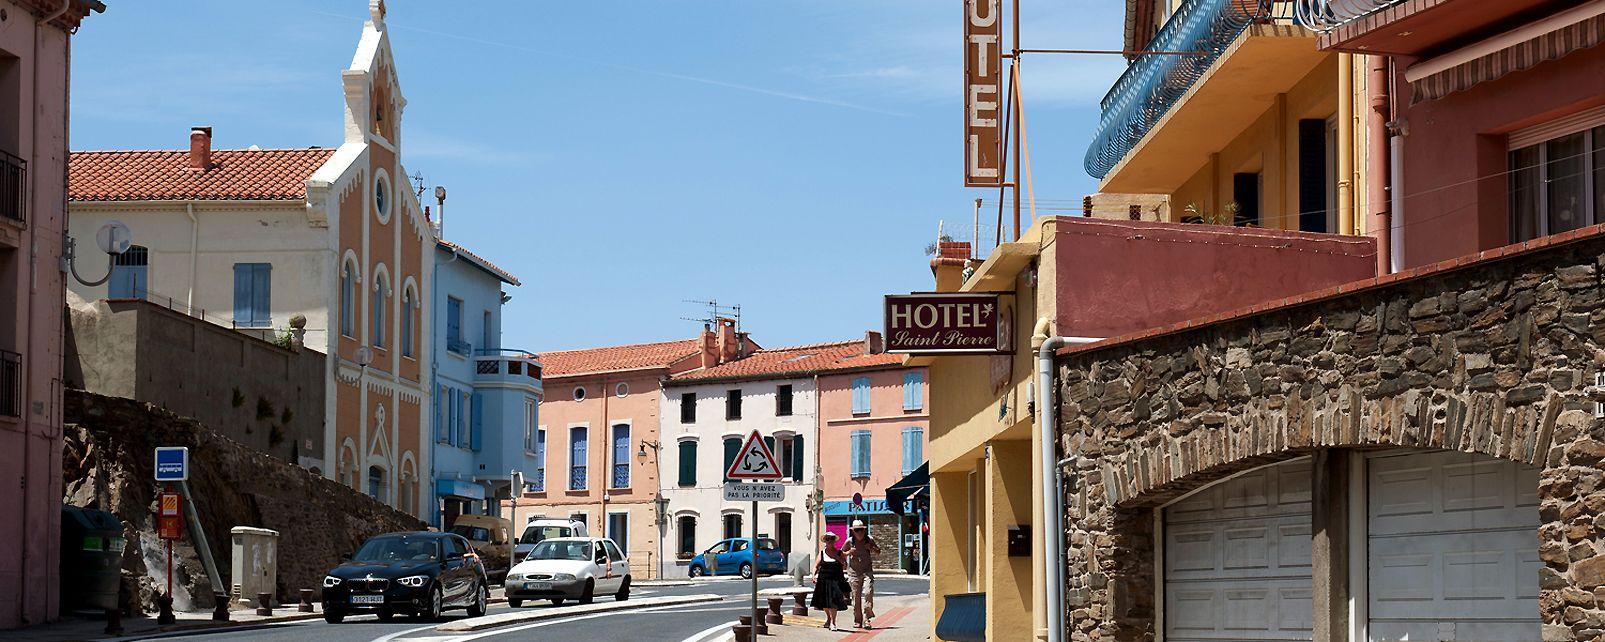 Hotel Le St Pierre